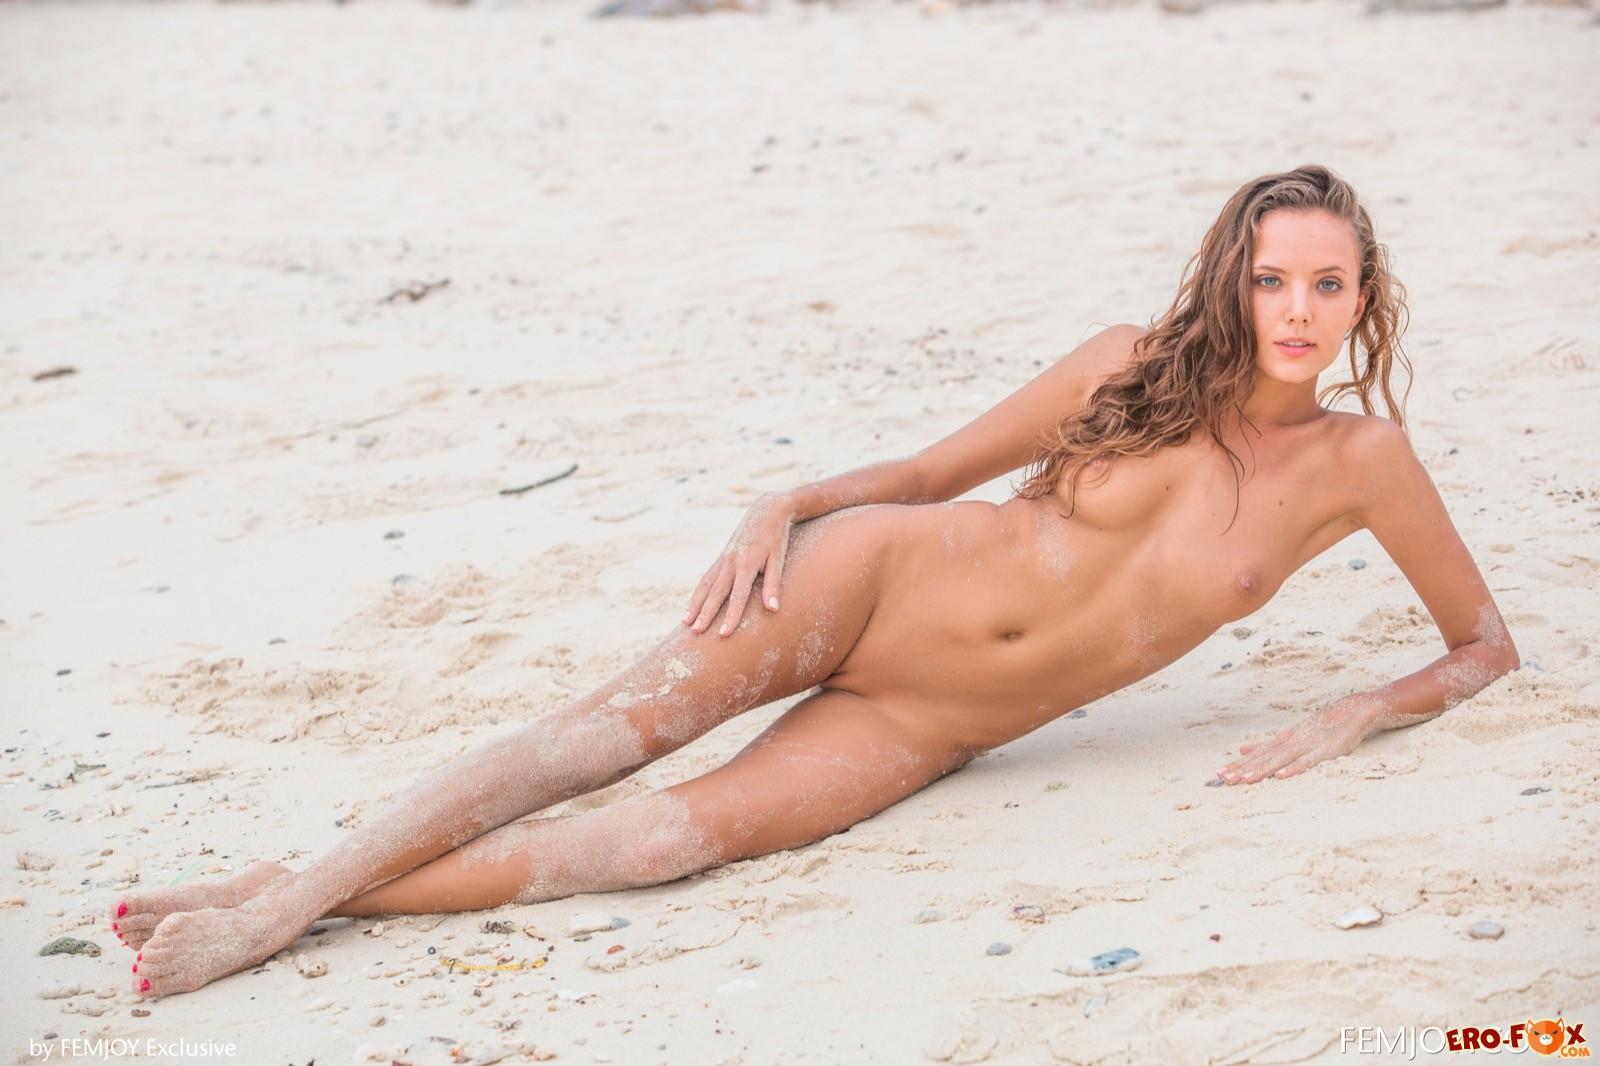 Девушка сняла стринги на пляже